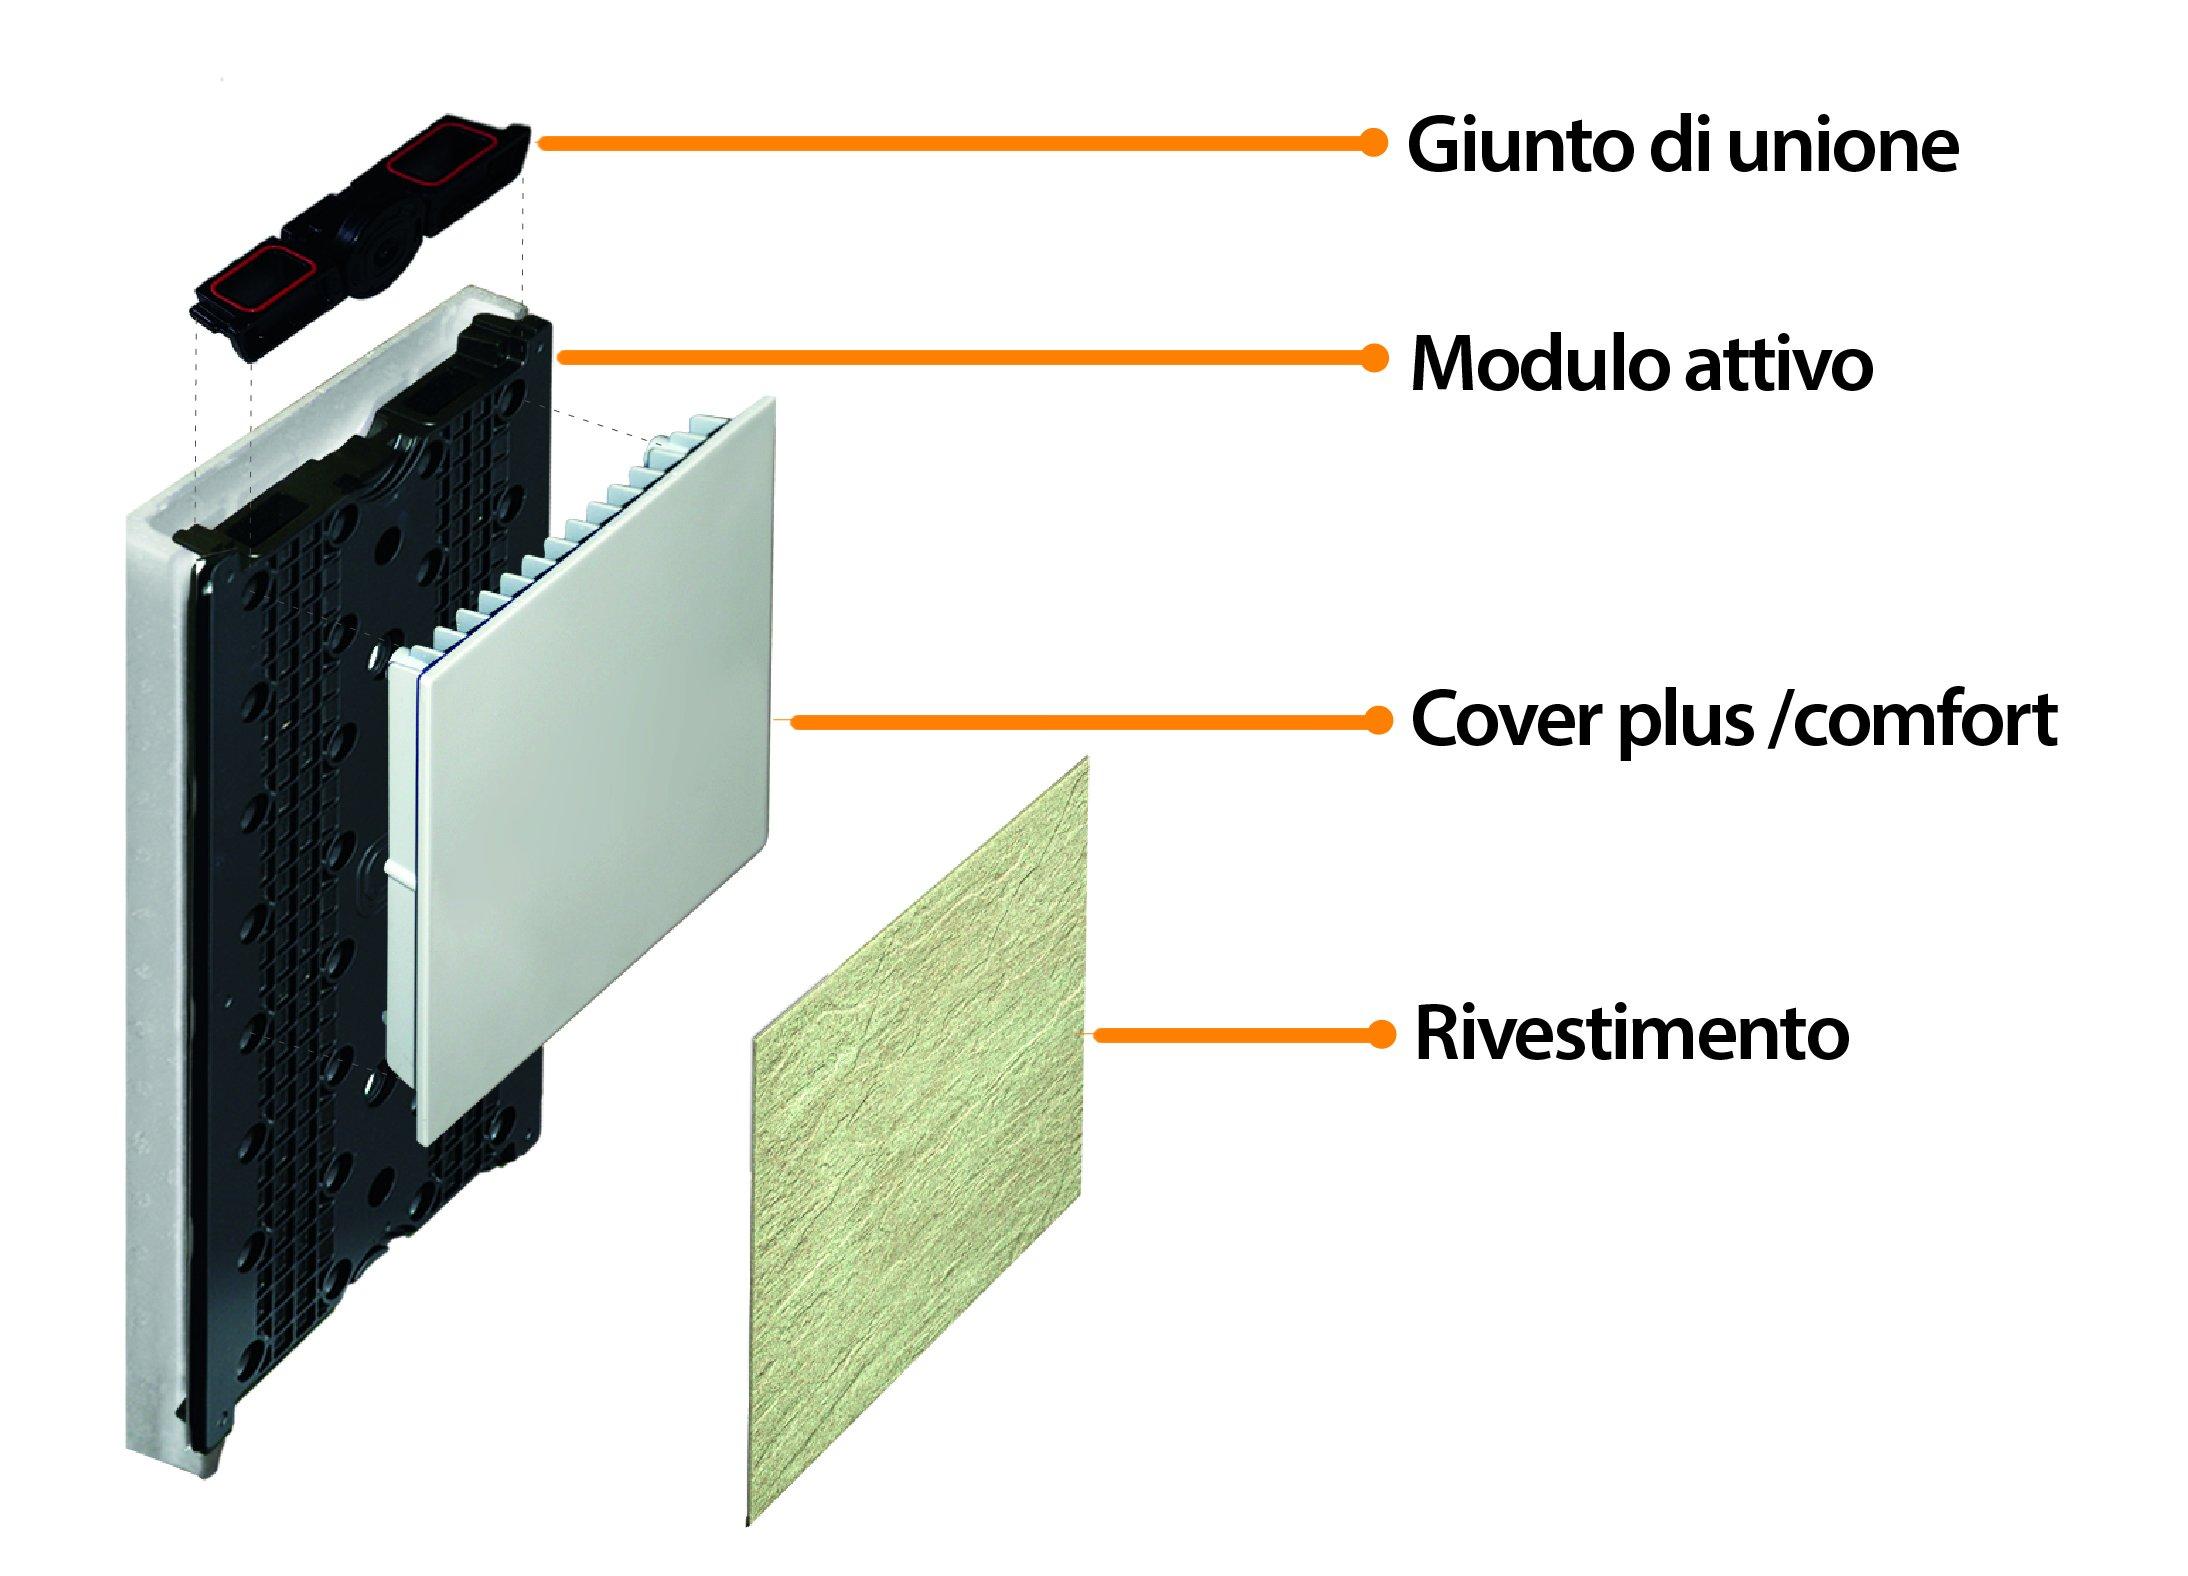 pannelli radianti Thermosaic: elementi costitutivi